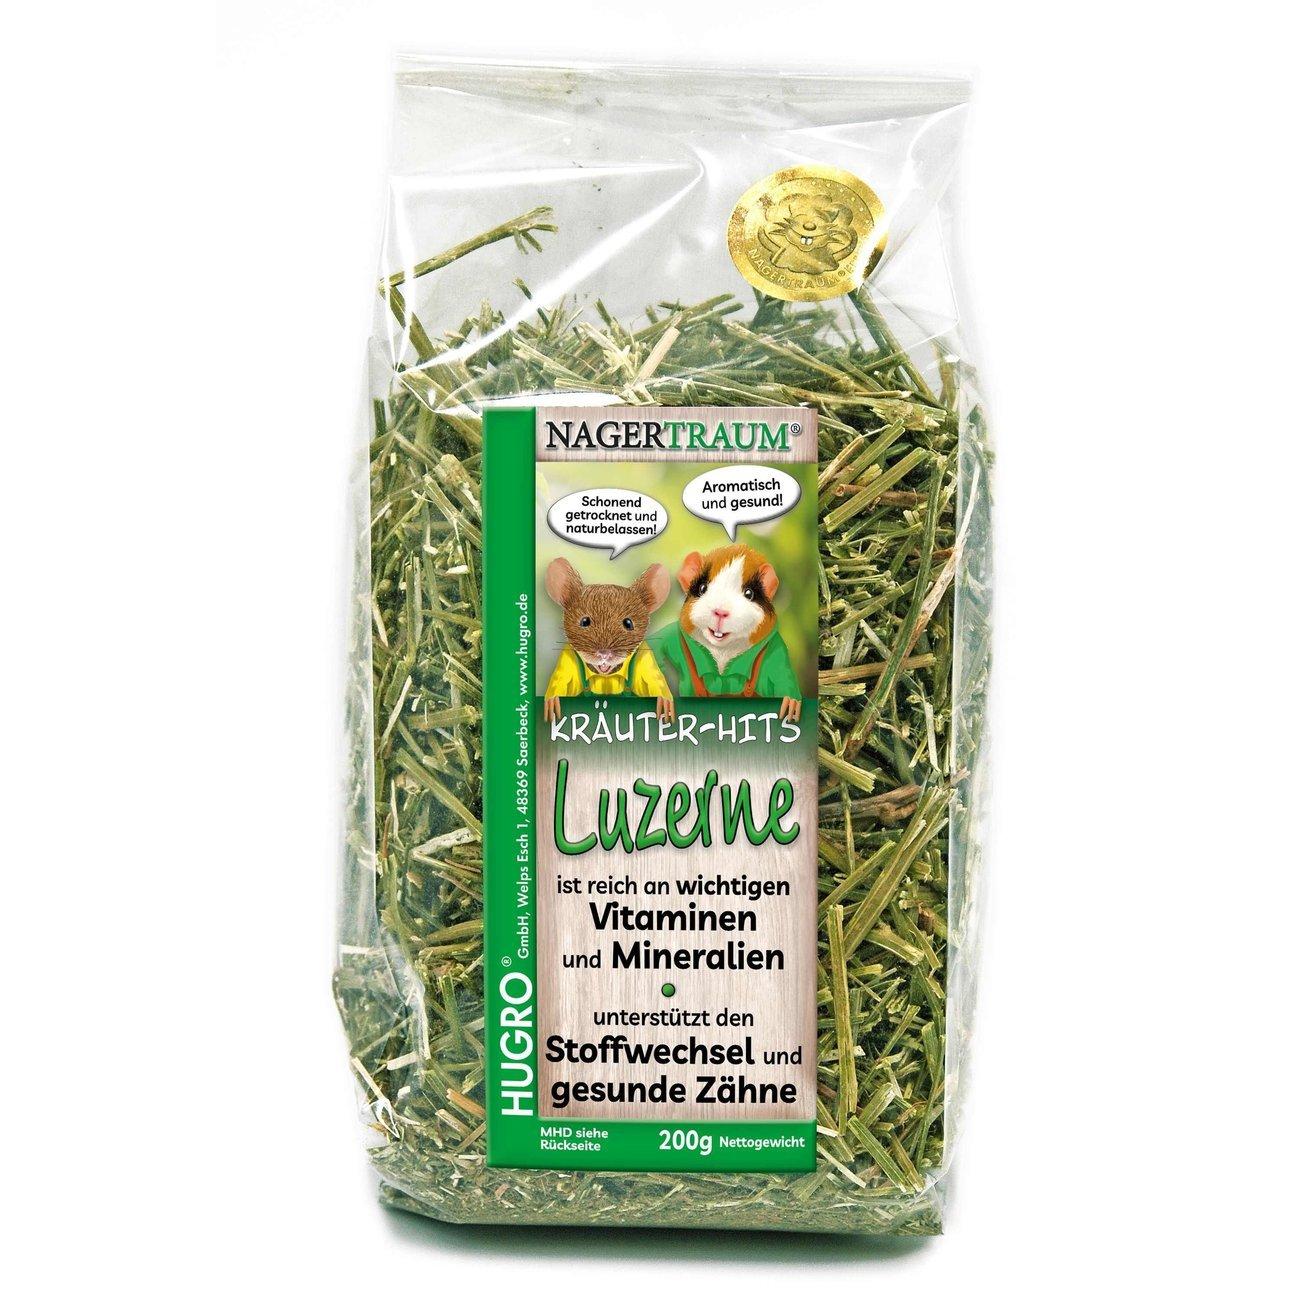 HUGRO® Nagertraum Luzerne, 200 g